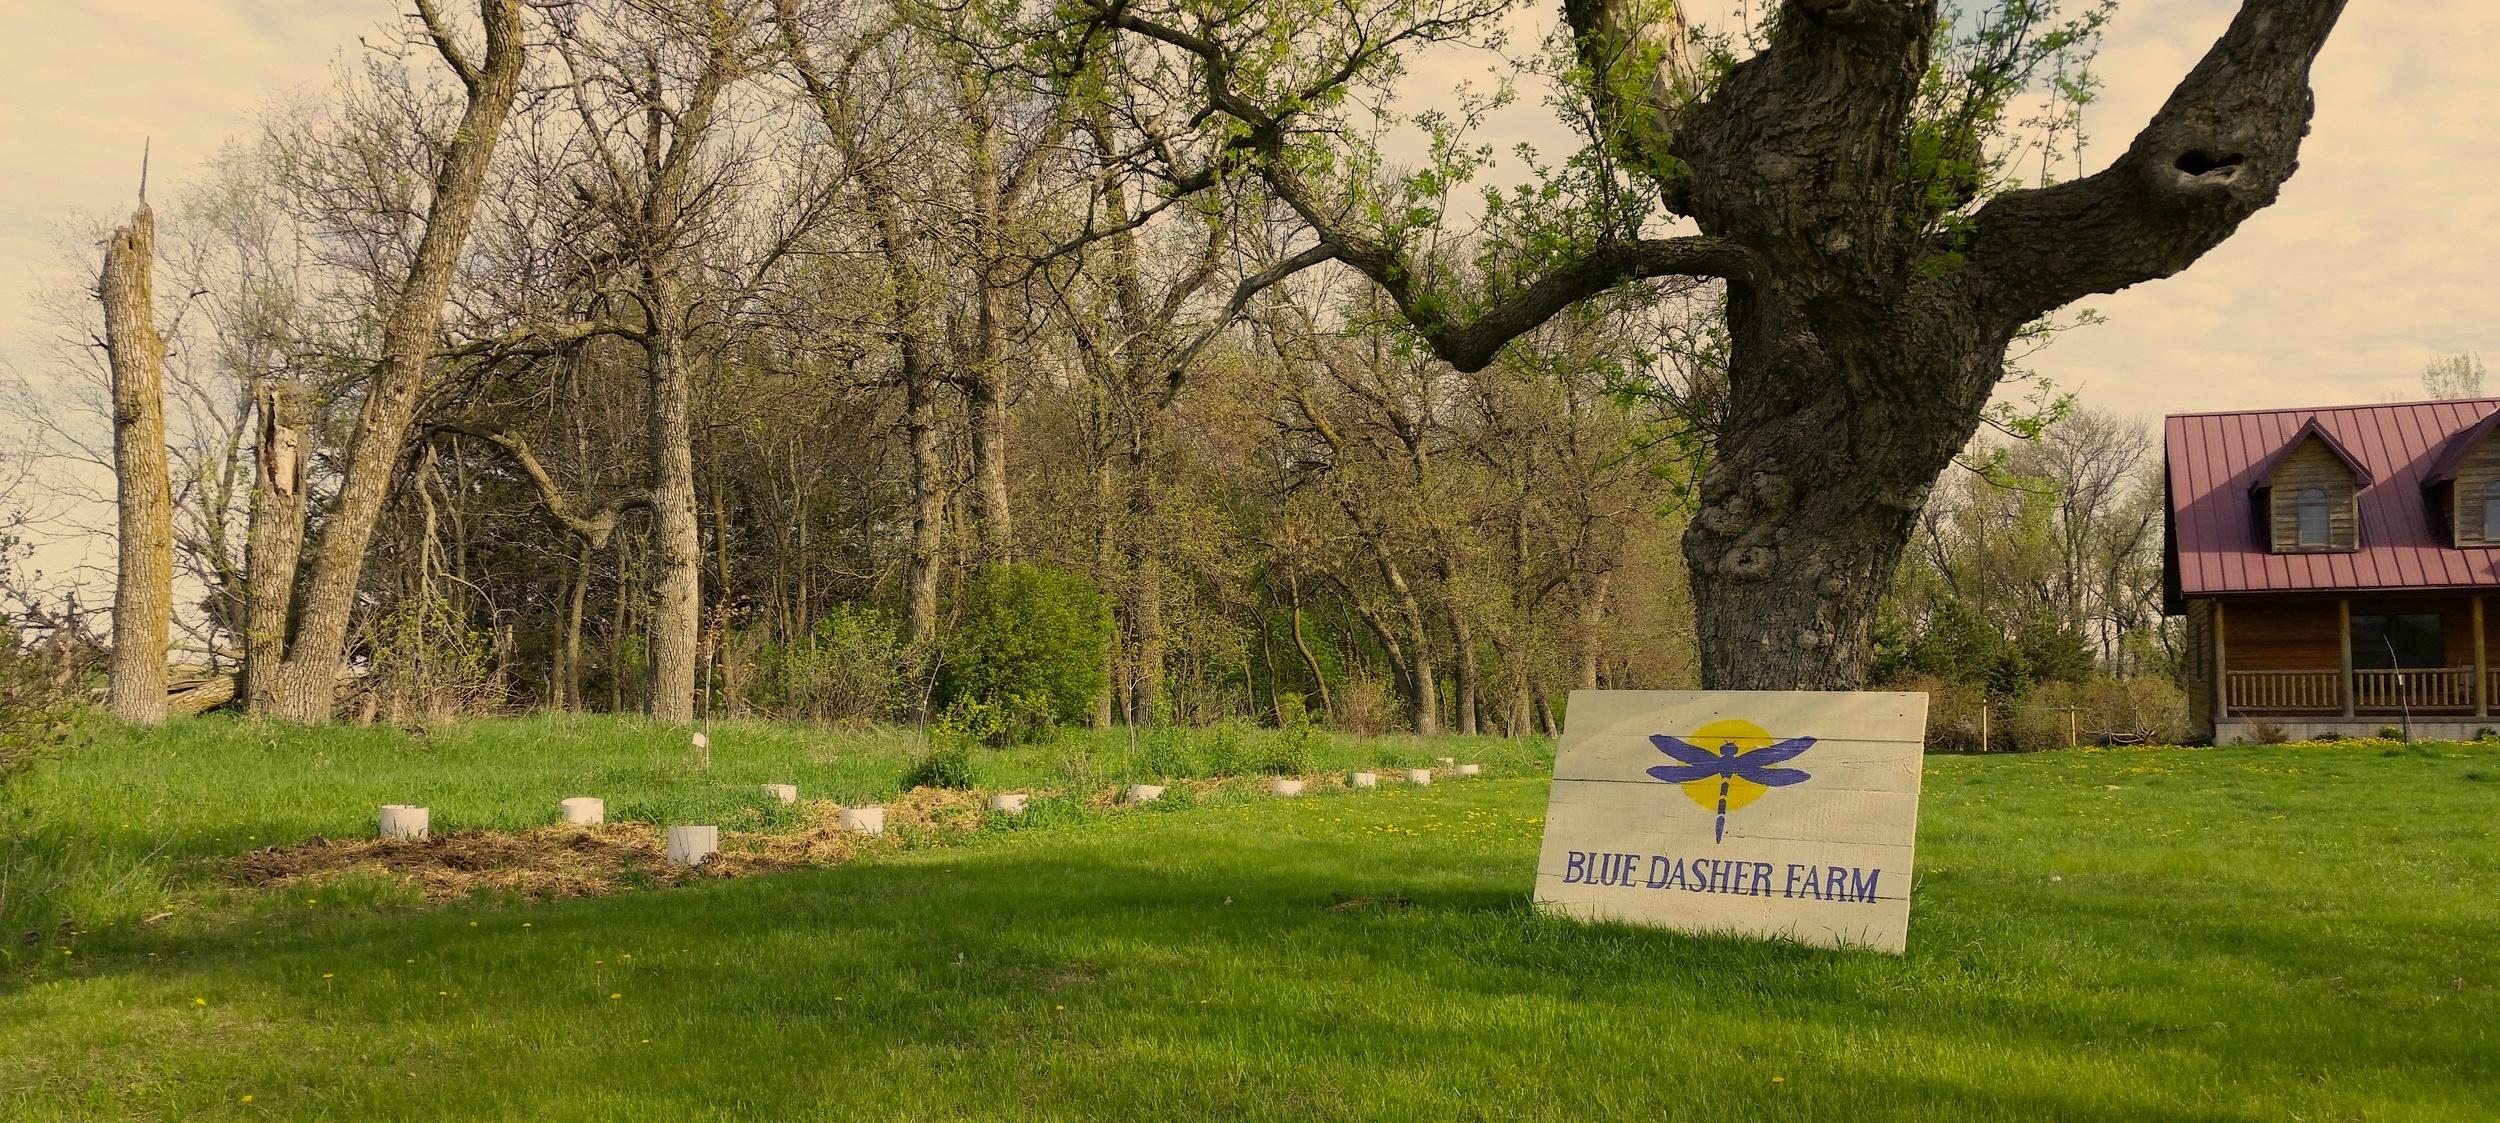 Blue Dasher Farm Store -